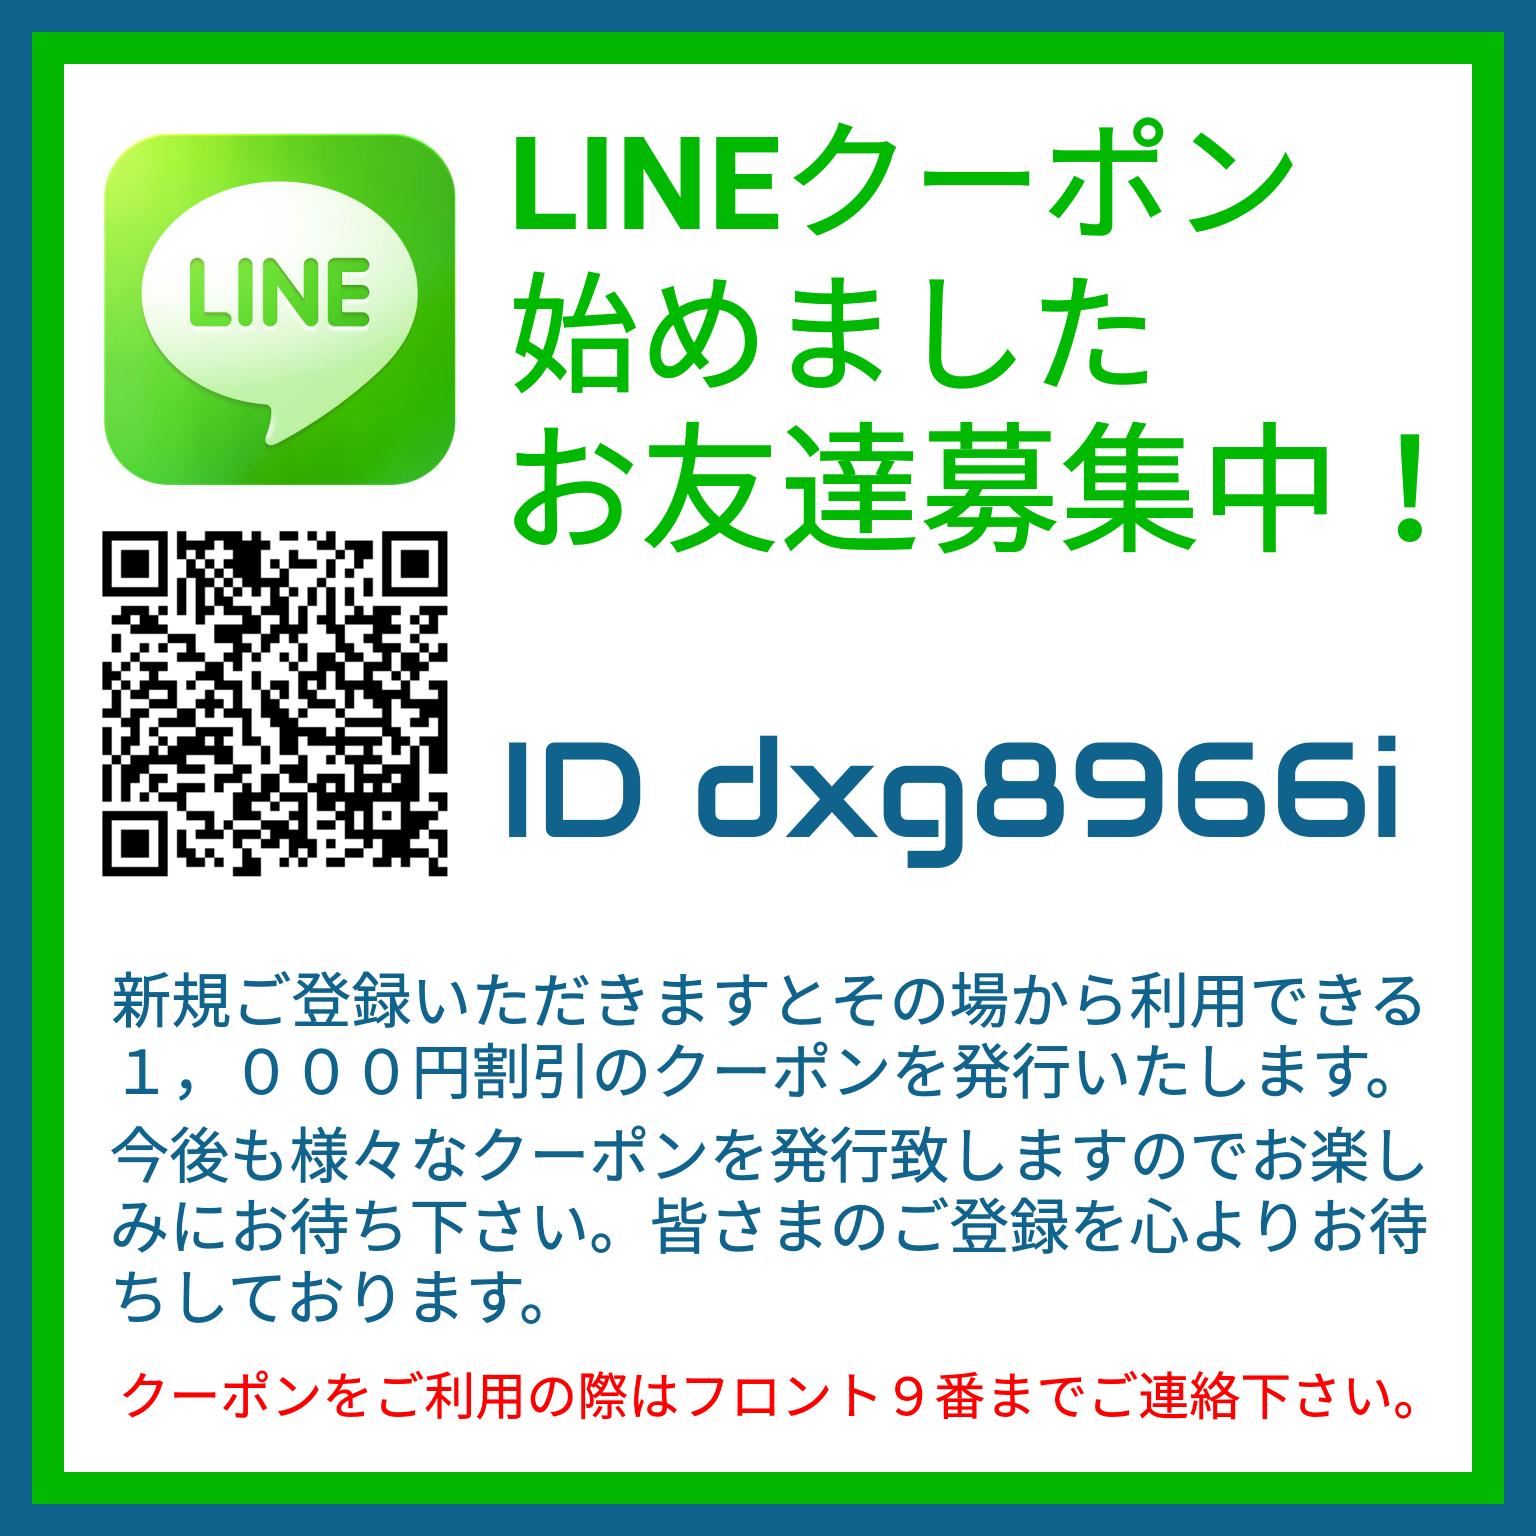 LINEのQRコードです☆_e0364685_21593480.png